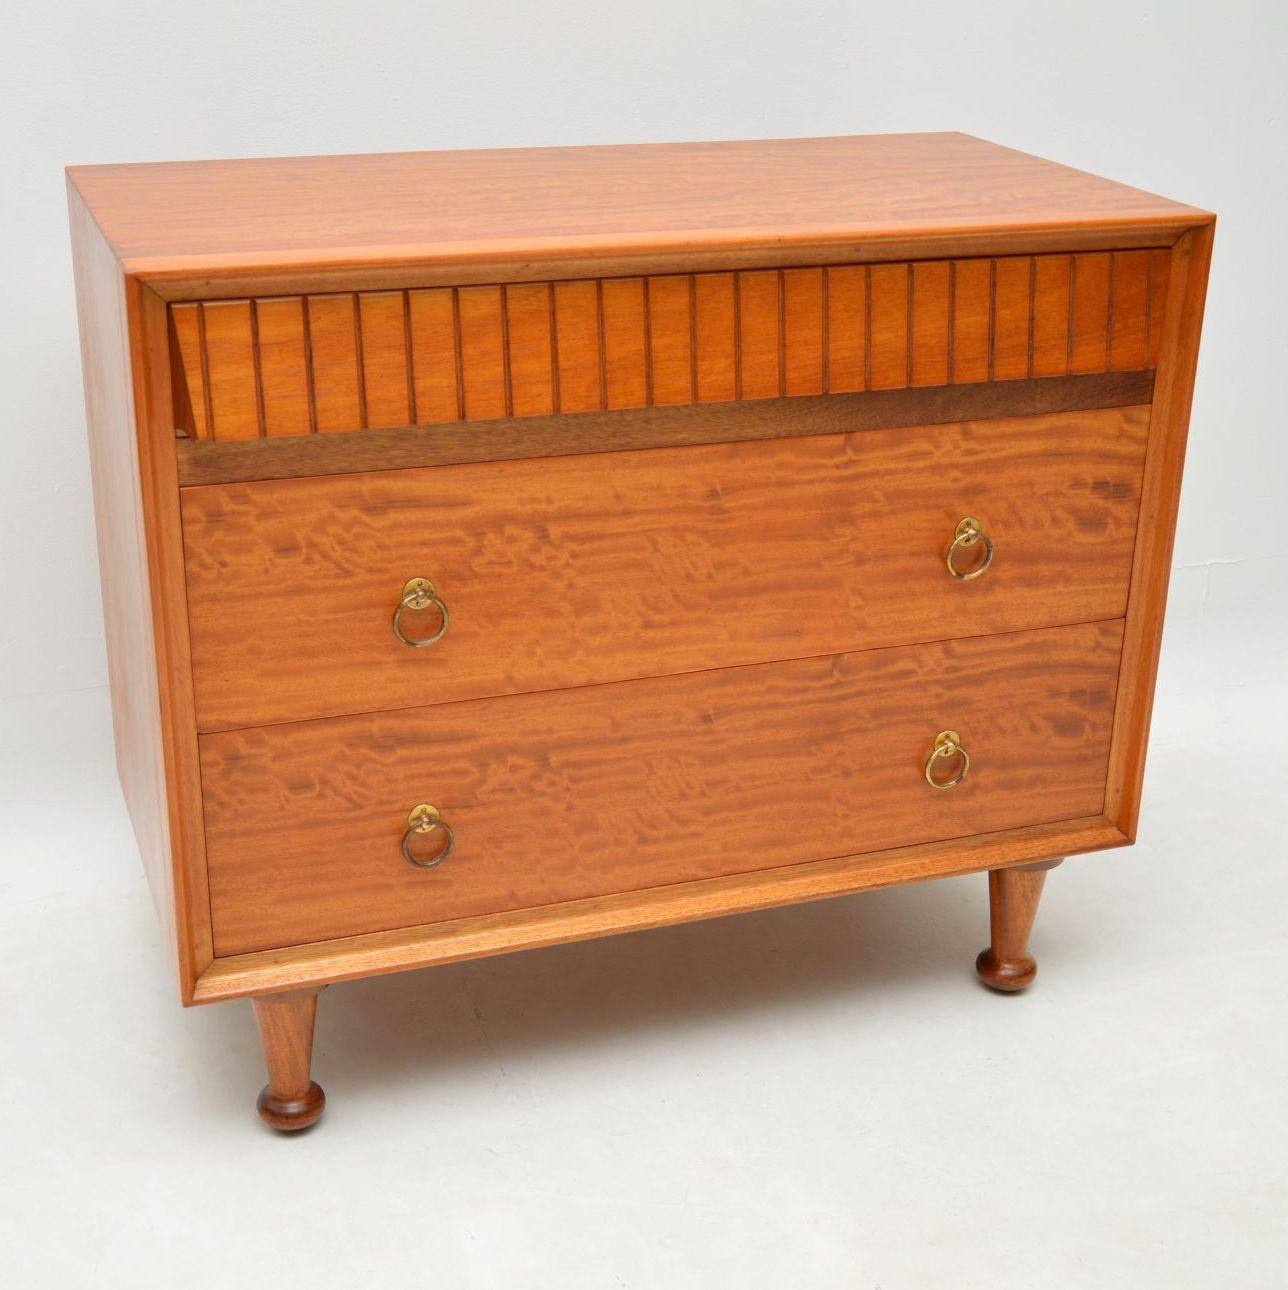 retro_vintage_satinwood_heals_chest_of_drawers_3